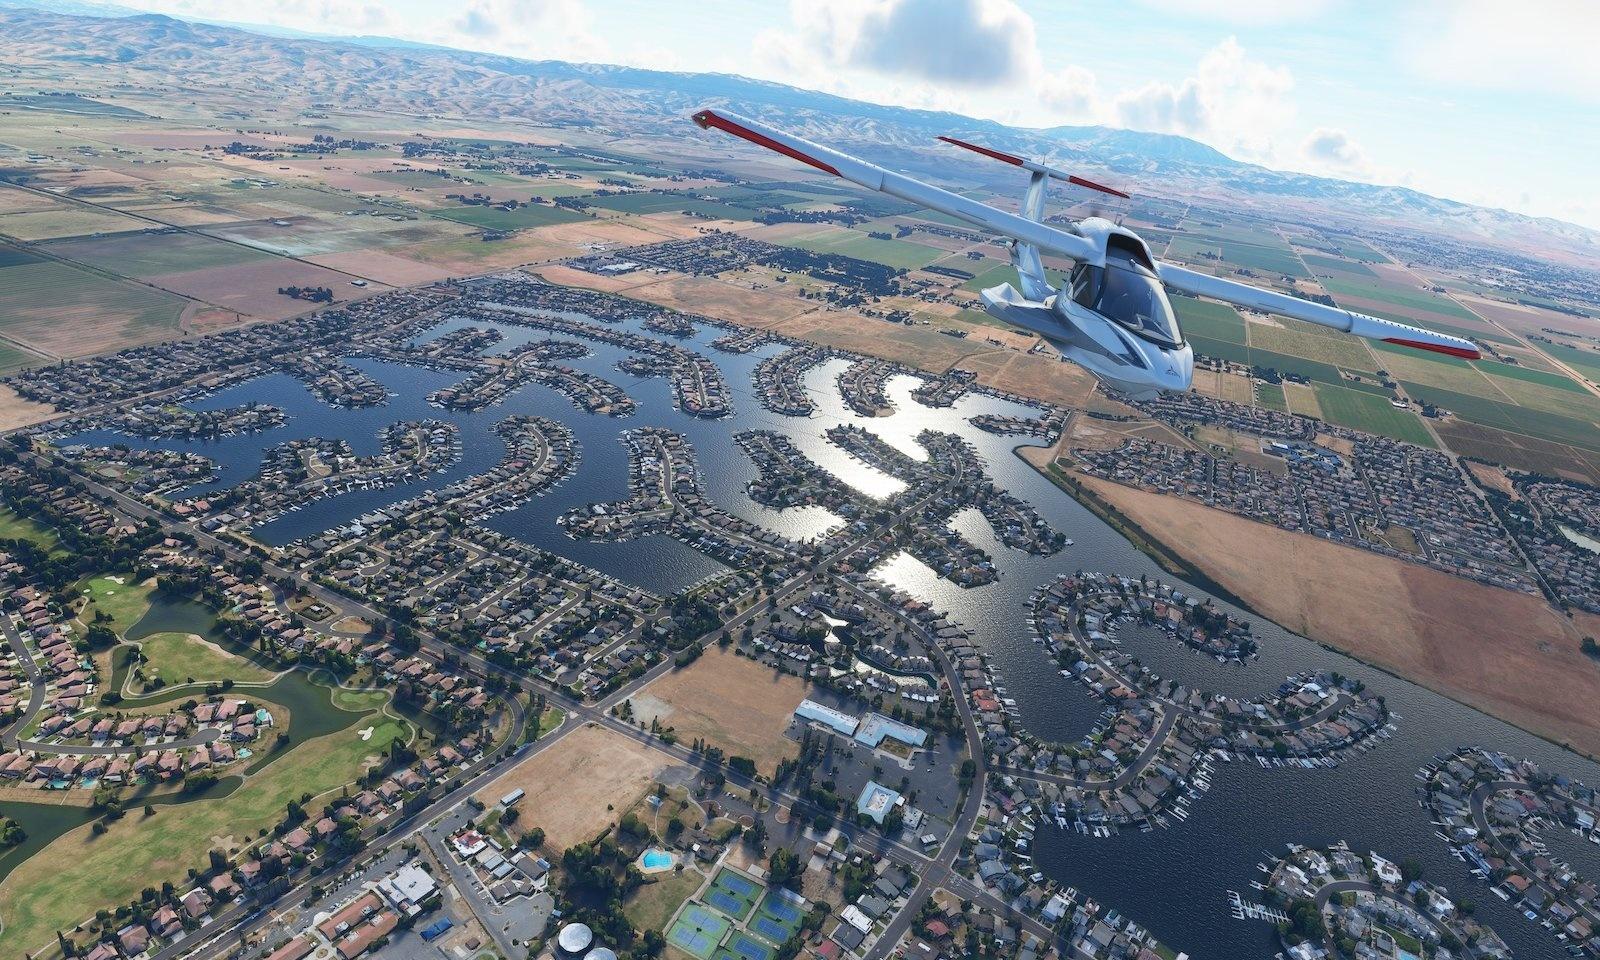 Microsoft Flight Simulator Vr Support Arrives In Late December (2)